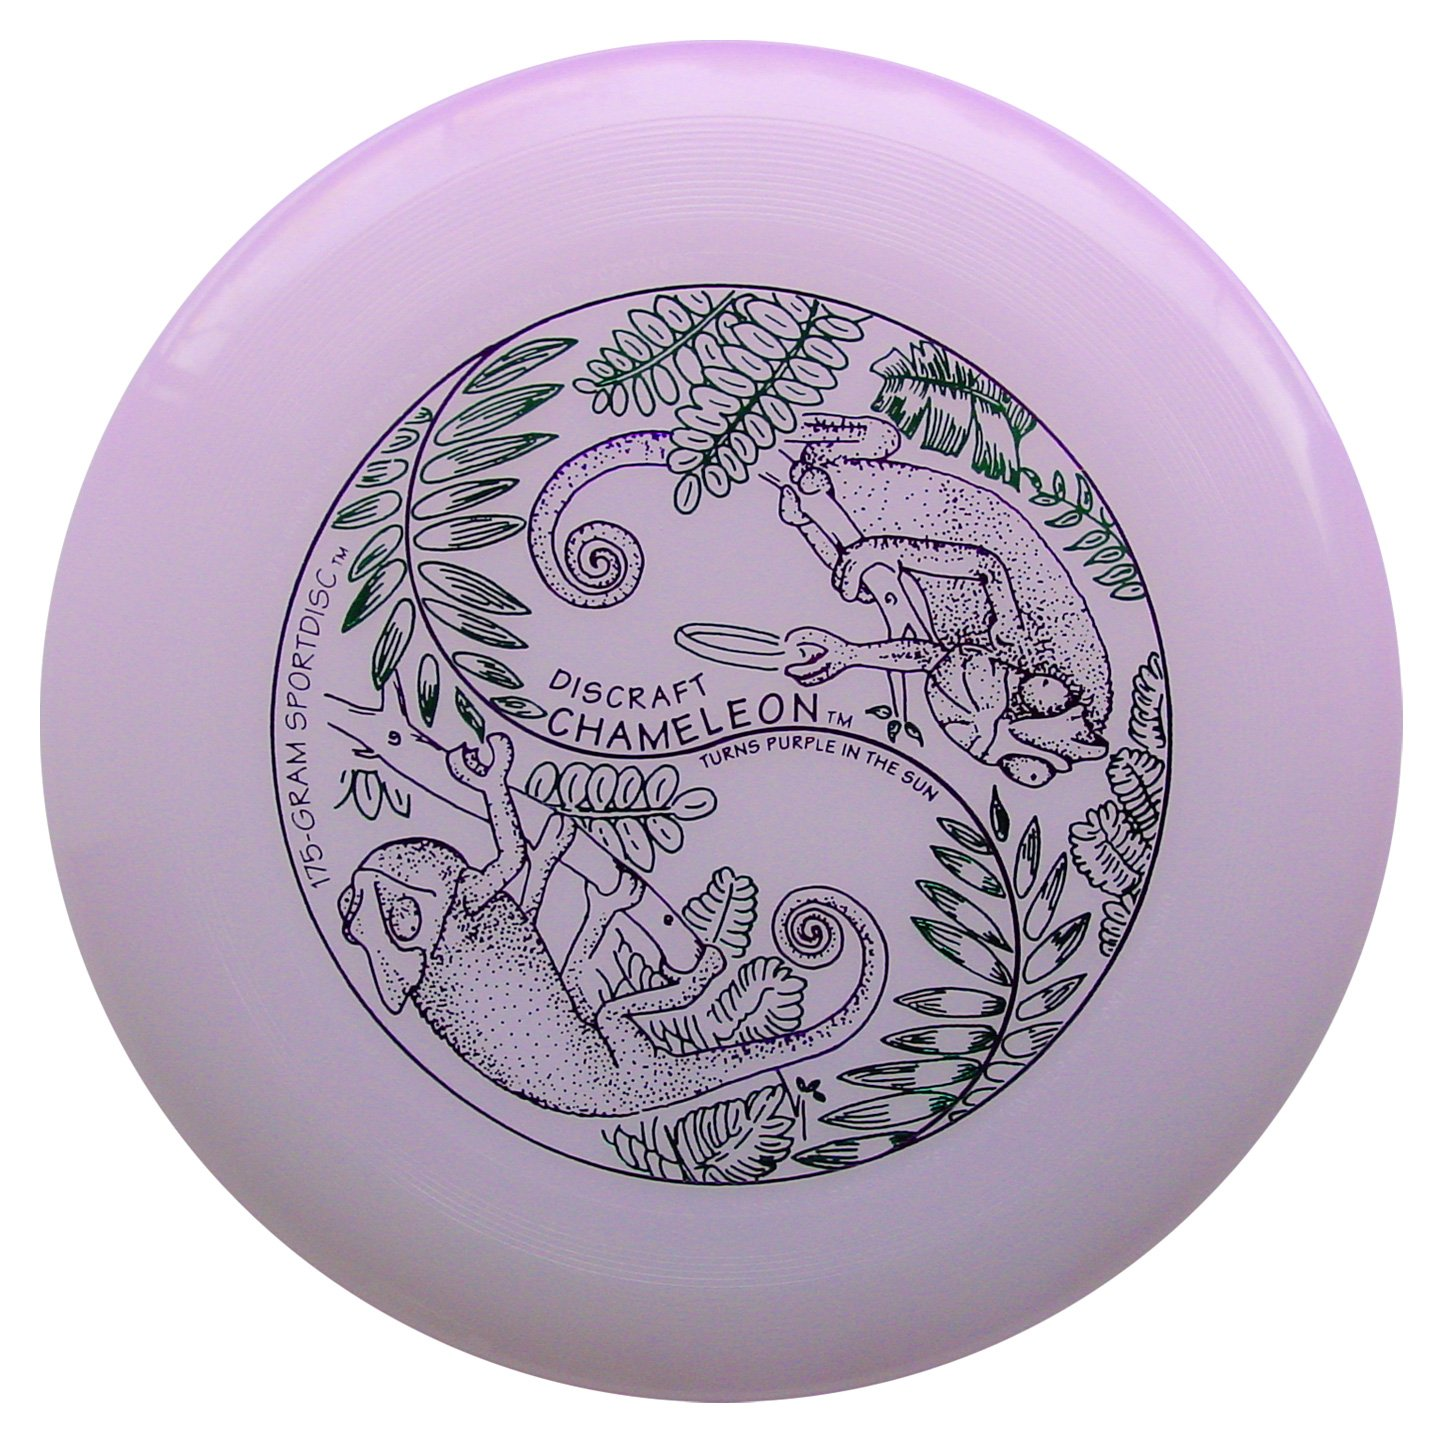 Frisbee Profesional Discraft 175 gramos / 27cm. Ultra Sta...